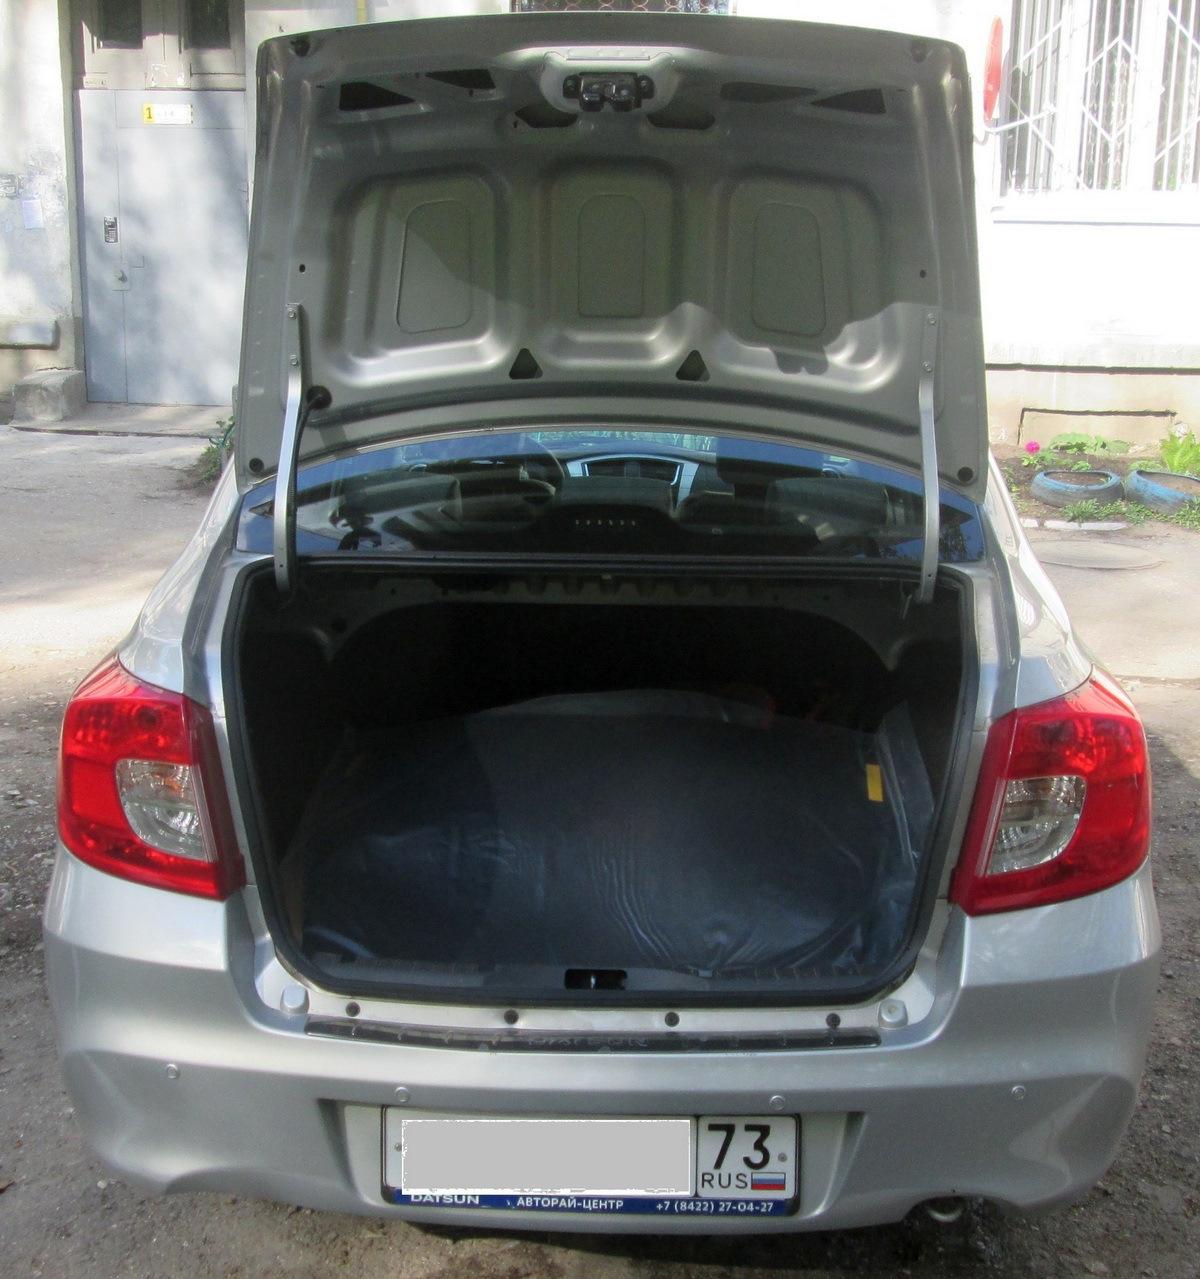 для возможности багажника датсун он до фото лето